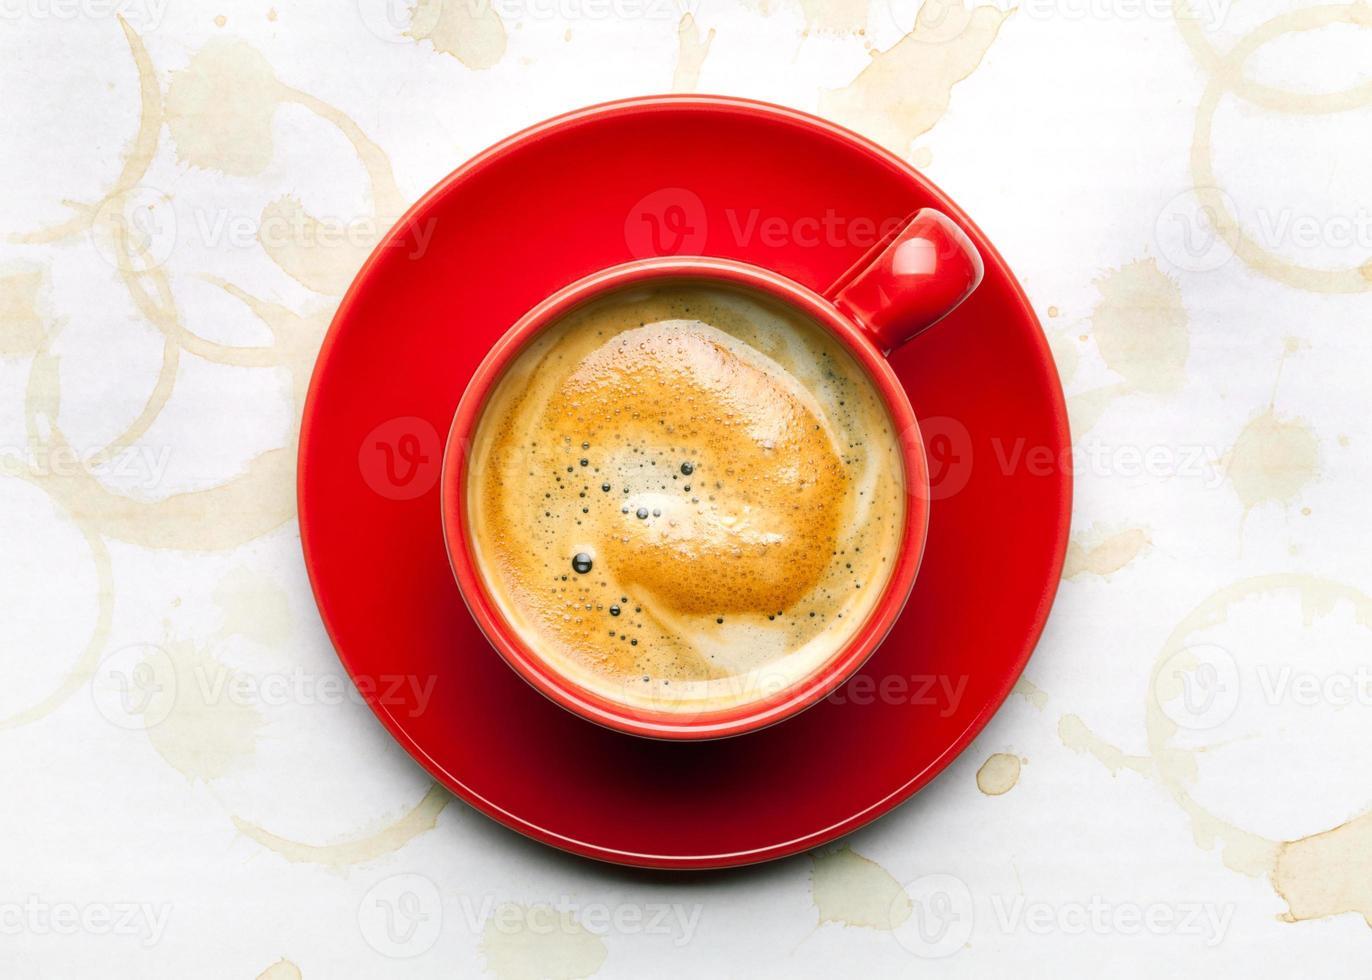 Kaffeetasse mit Kaffeeflecken foto